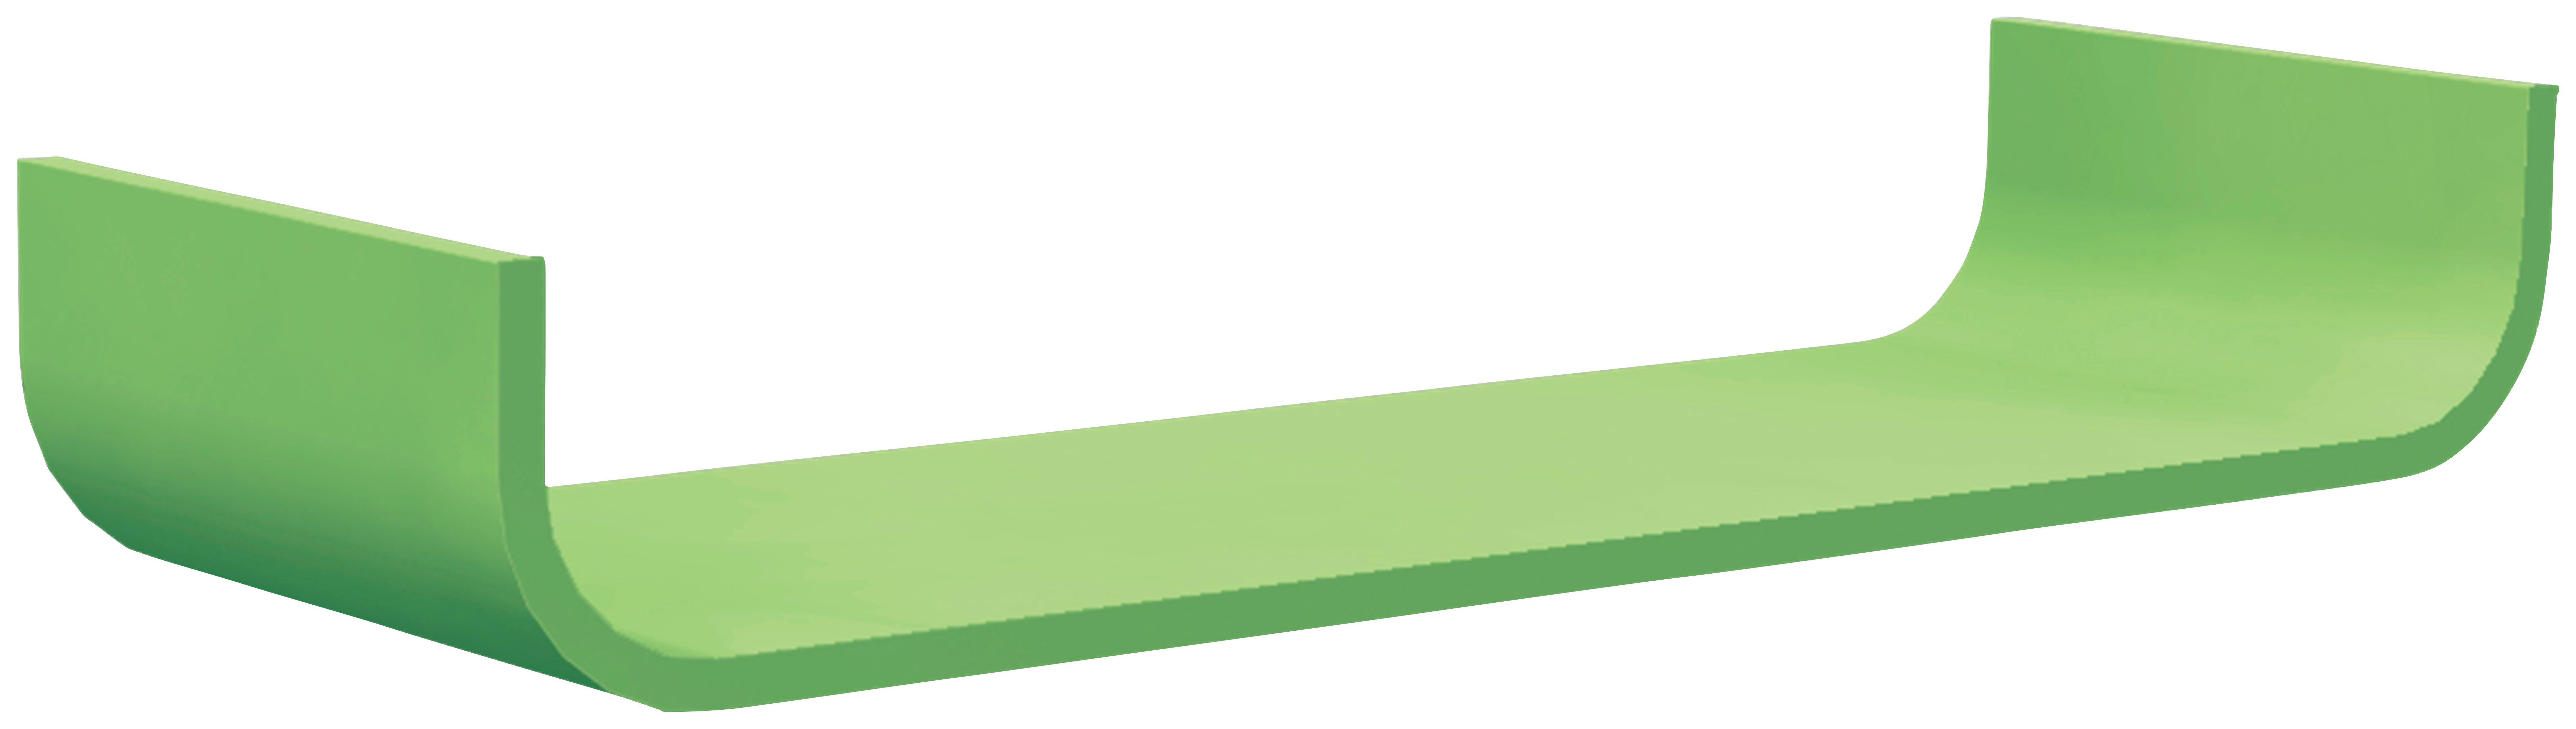 WANDBOARD Birke massiv Grün - Grün, Design, Holz (80/12/25cm) - CARRYHOME